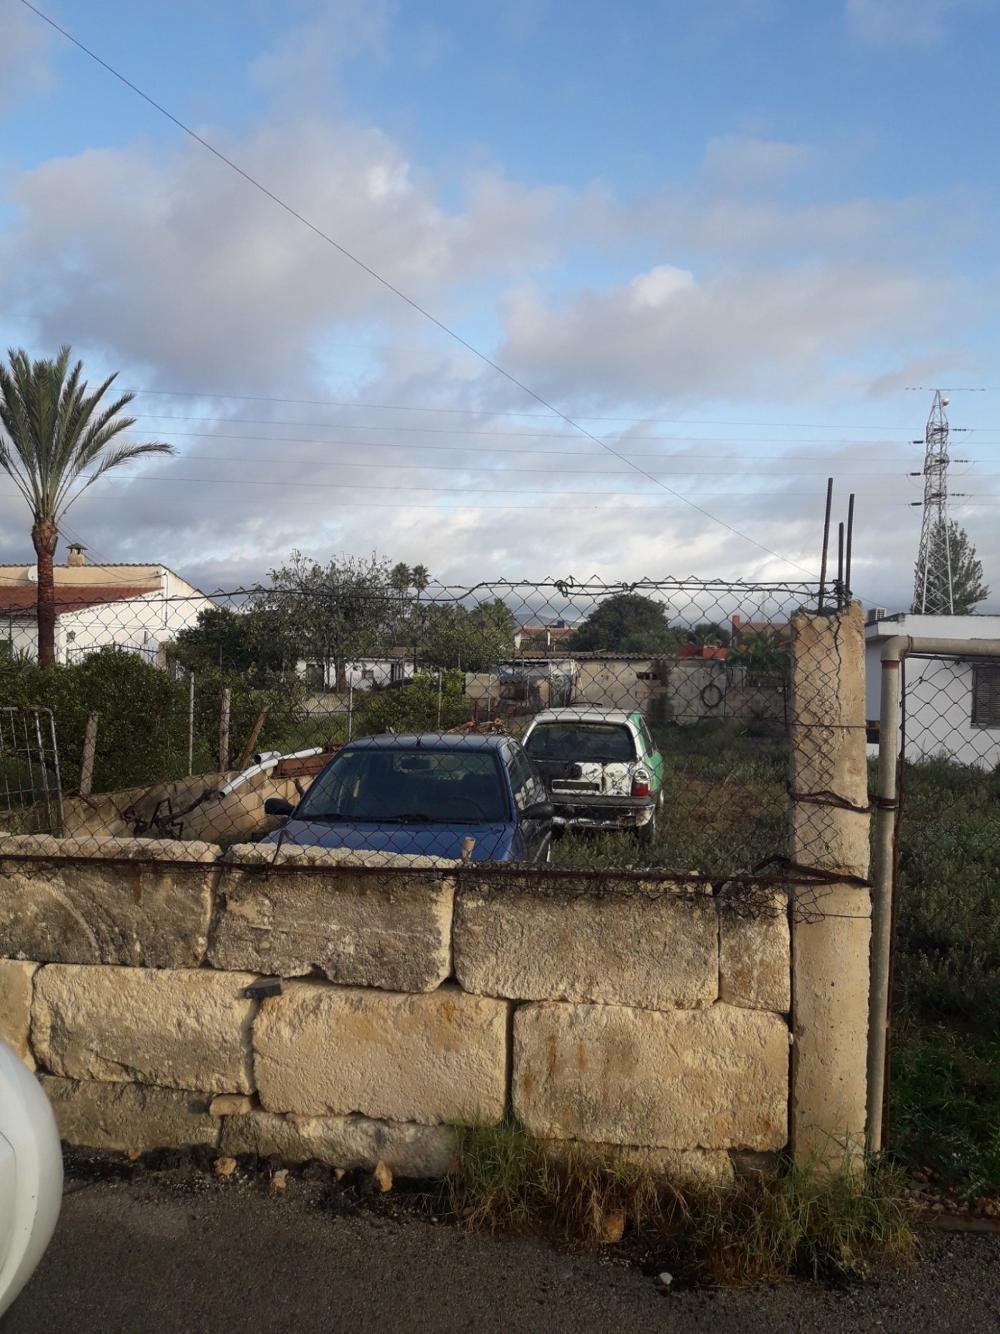 estadio balear-son nadal majorque terrain photo 3049681